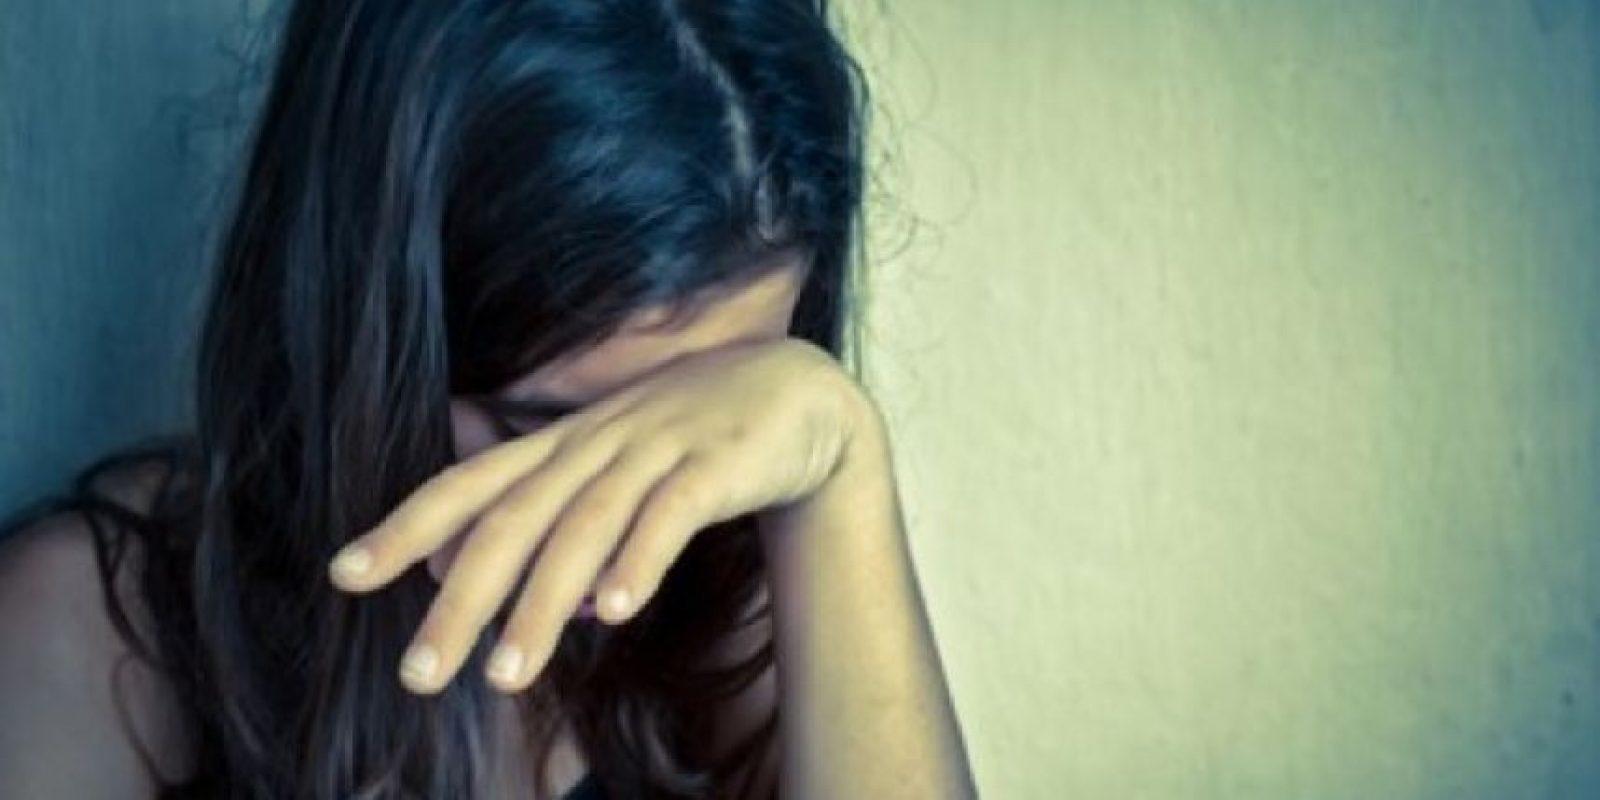 Si Bubb se atrevía a decirlo mal, demasiado rápido o demasiado lento, Sapphiro comenzaba a golpearla. Foto:Tumblr.com/tagged-mujer-maltrato